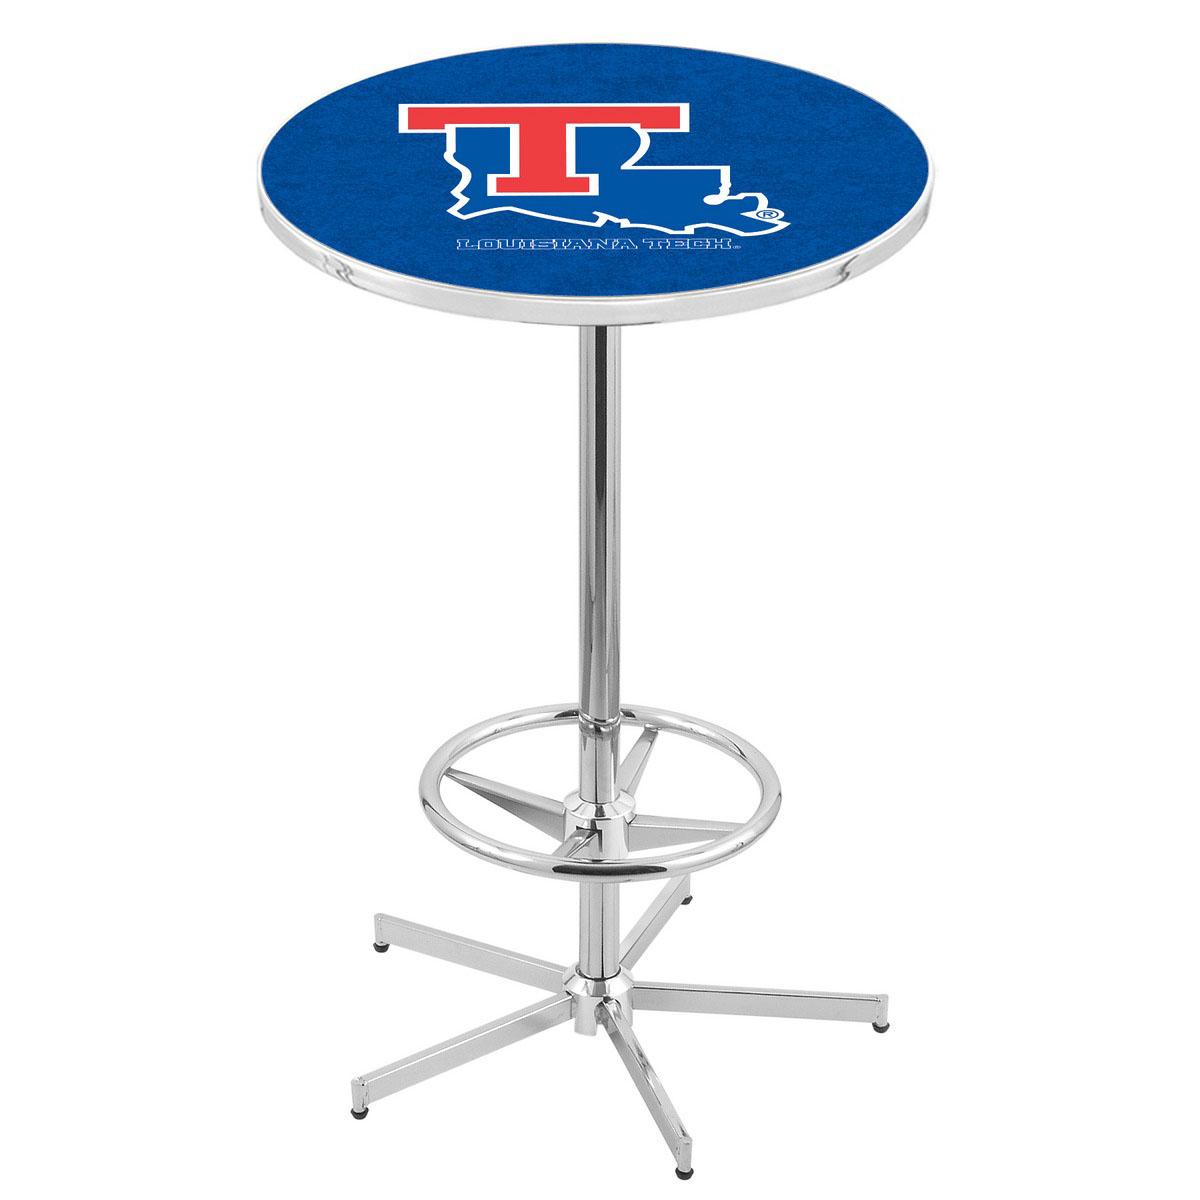 Buy Chrome Louisiana Tech Pub Table Product Photo